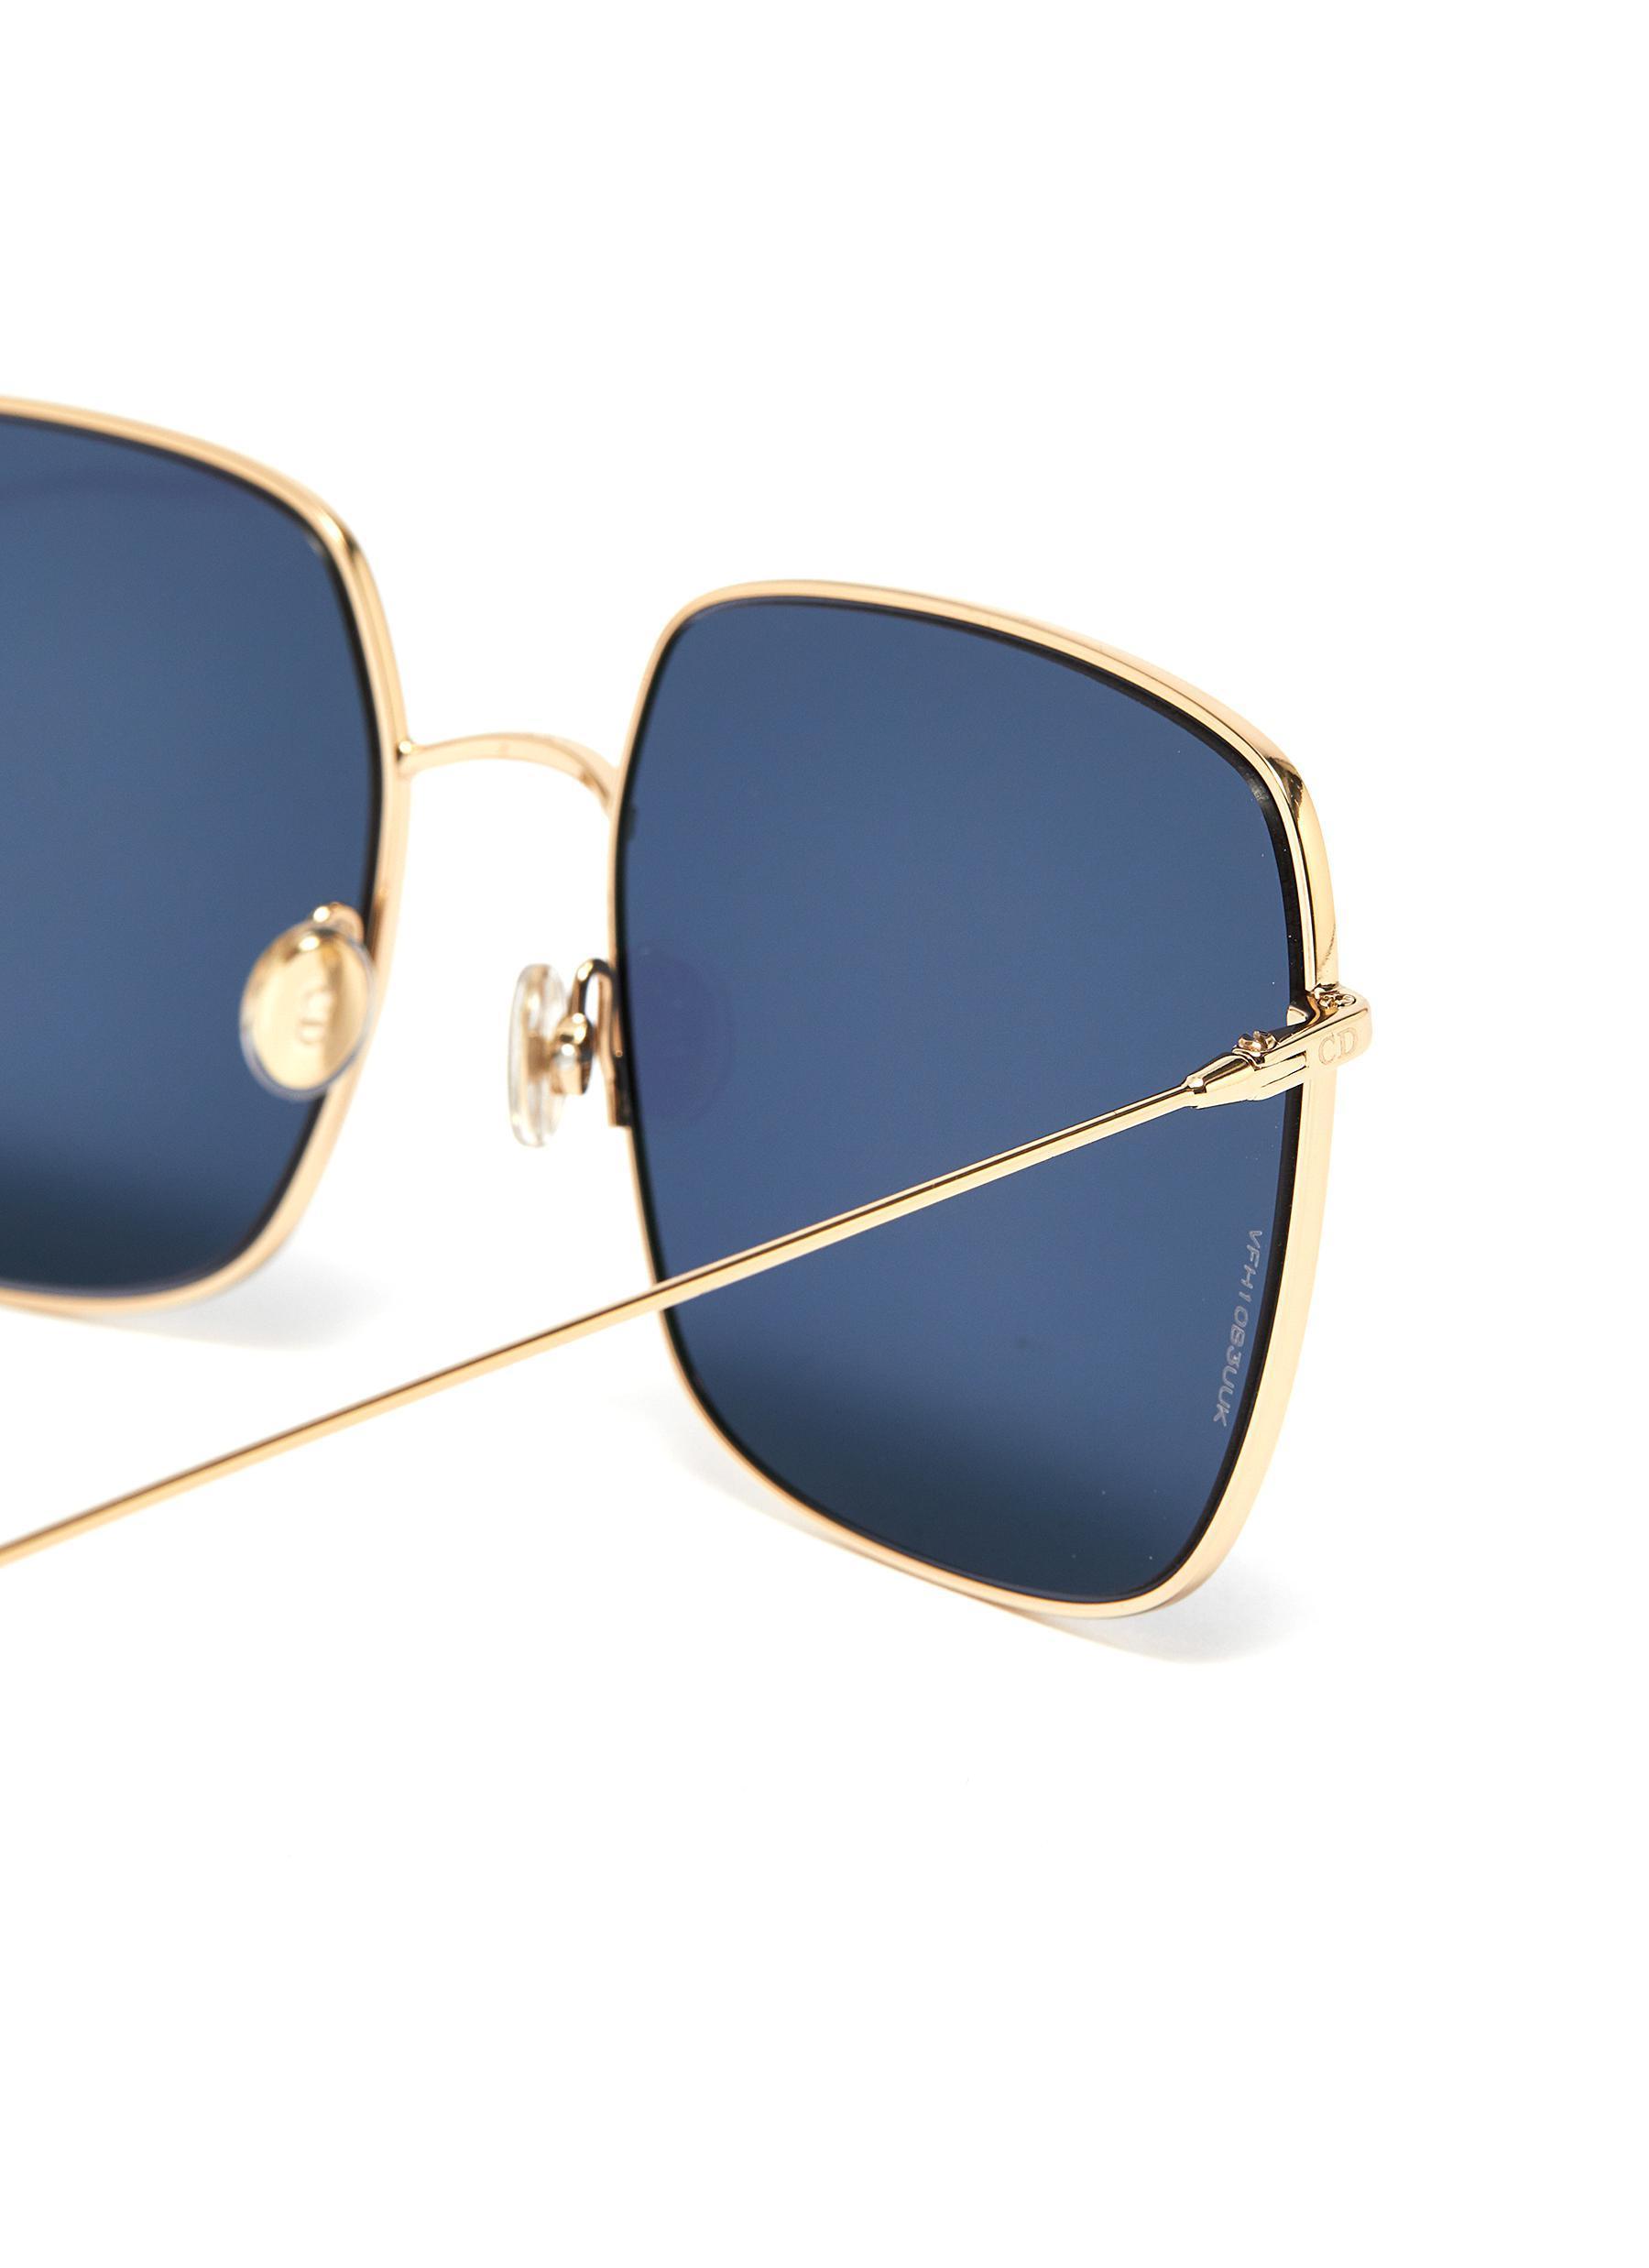 cd94de5cfb44 Dior - Metallic ' Stellaire 1' Metal Square Sunglasses - Lyst. View  fullscreen